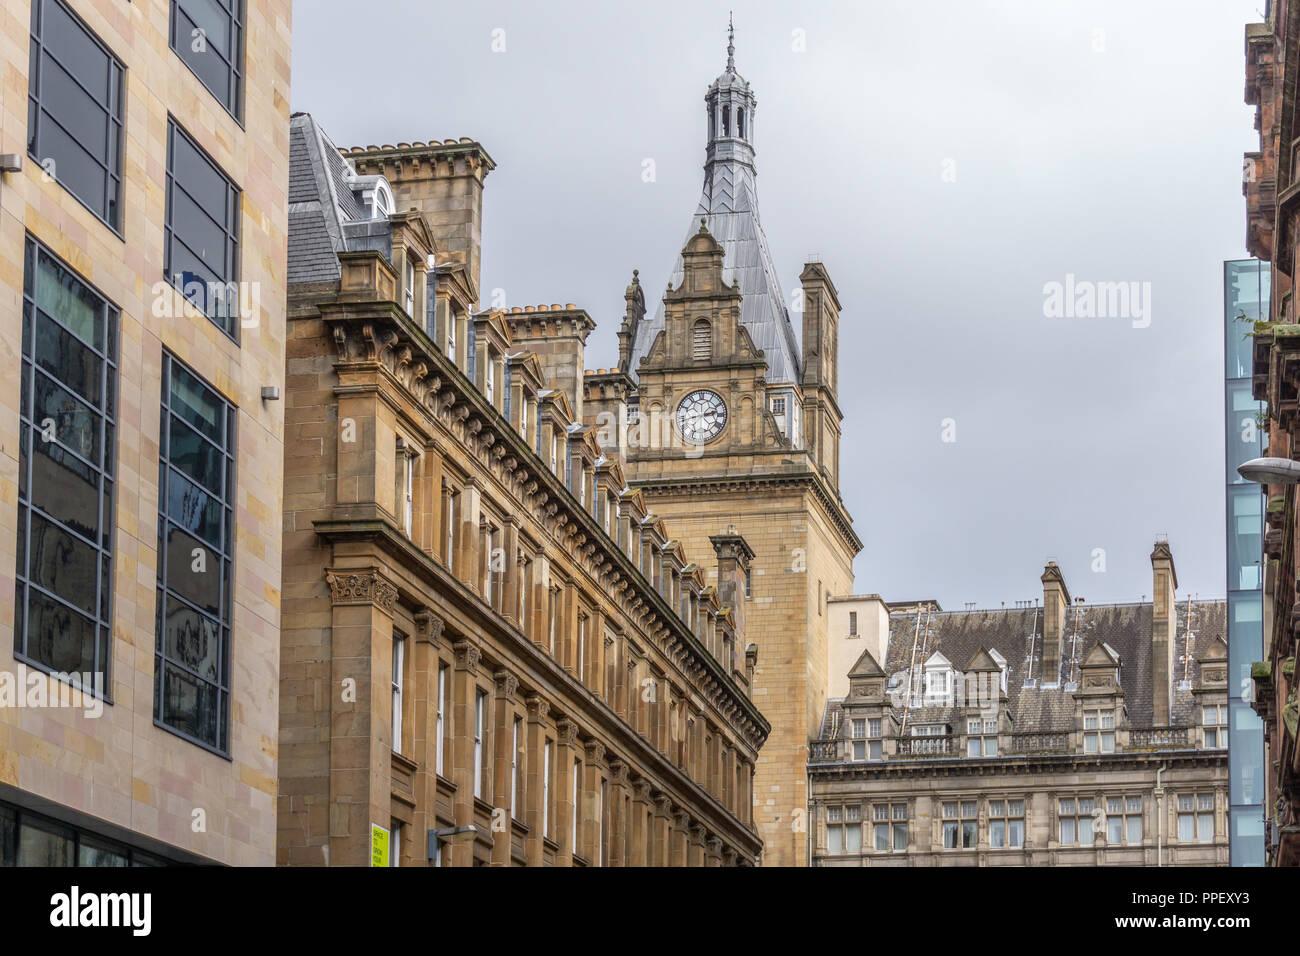 Glasgow City, Scotland, UK - September 22, 2018: Impressive architectural design of the Central Station's Clock Tower. - Stock Image